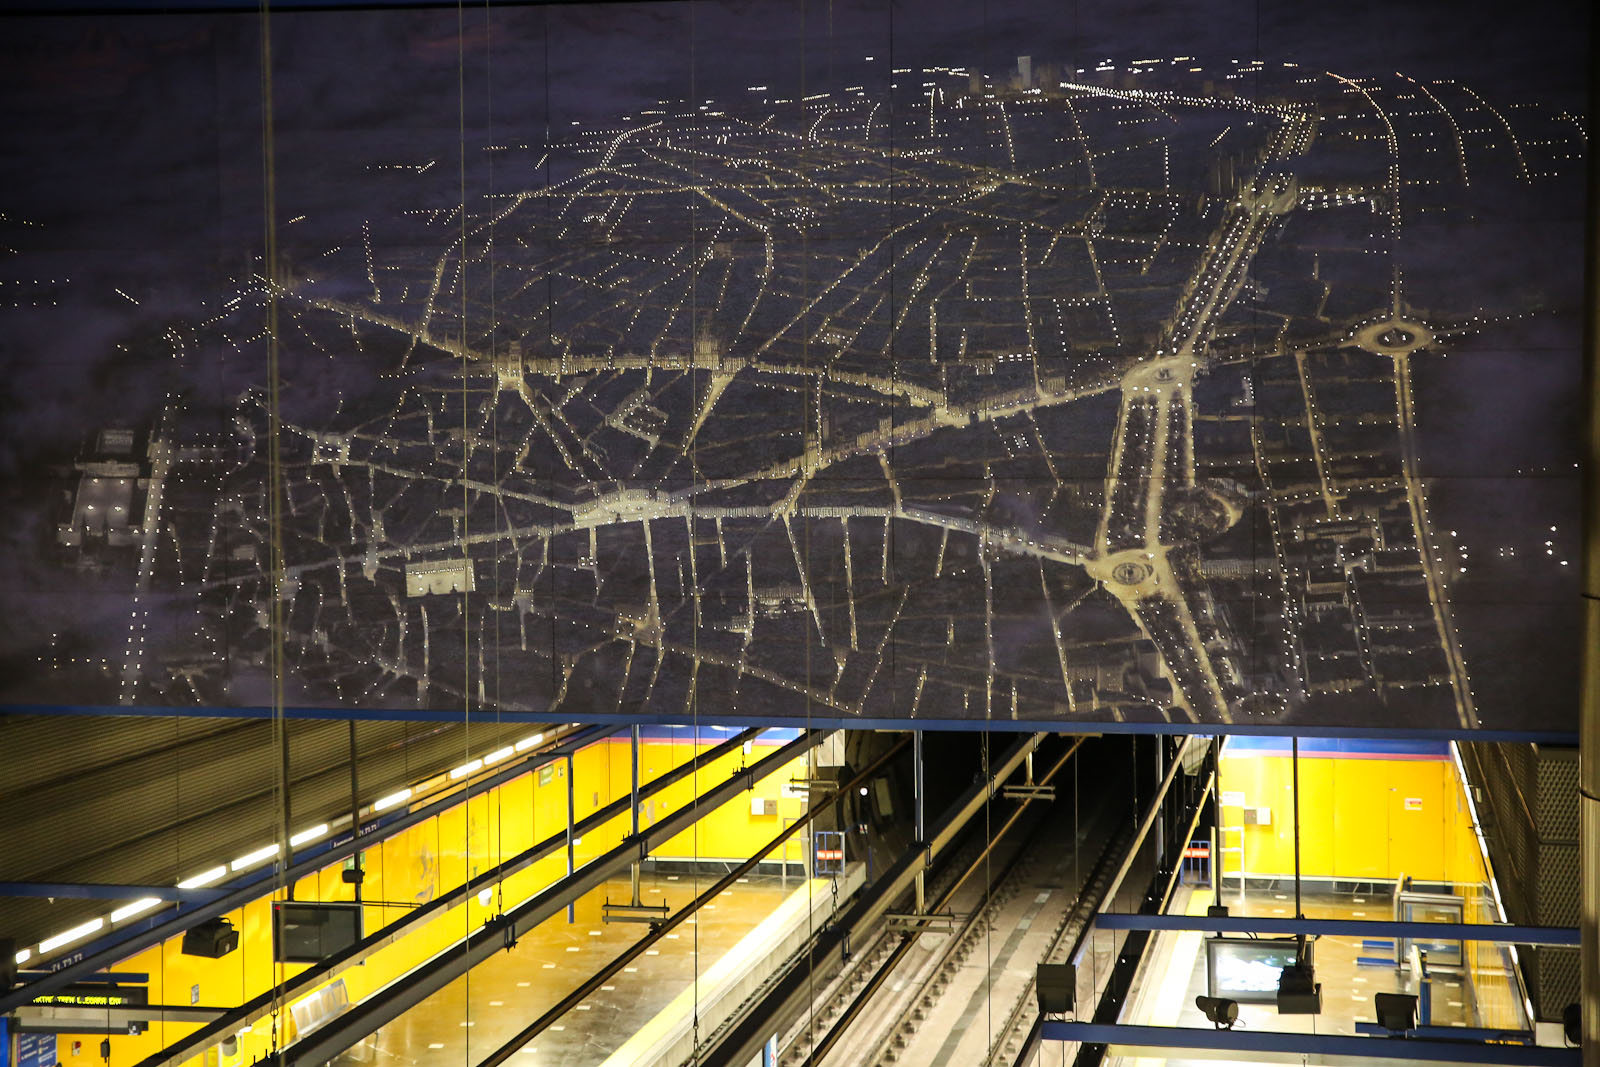 Станция метро в аэропорту Барахас в Мадриде